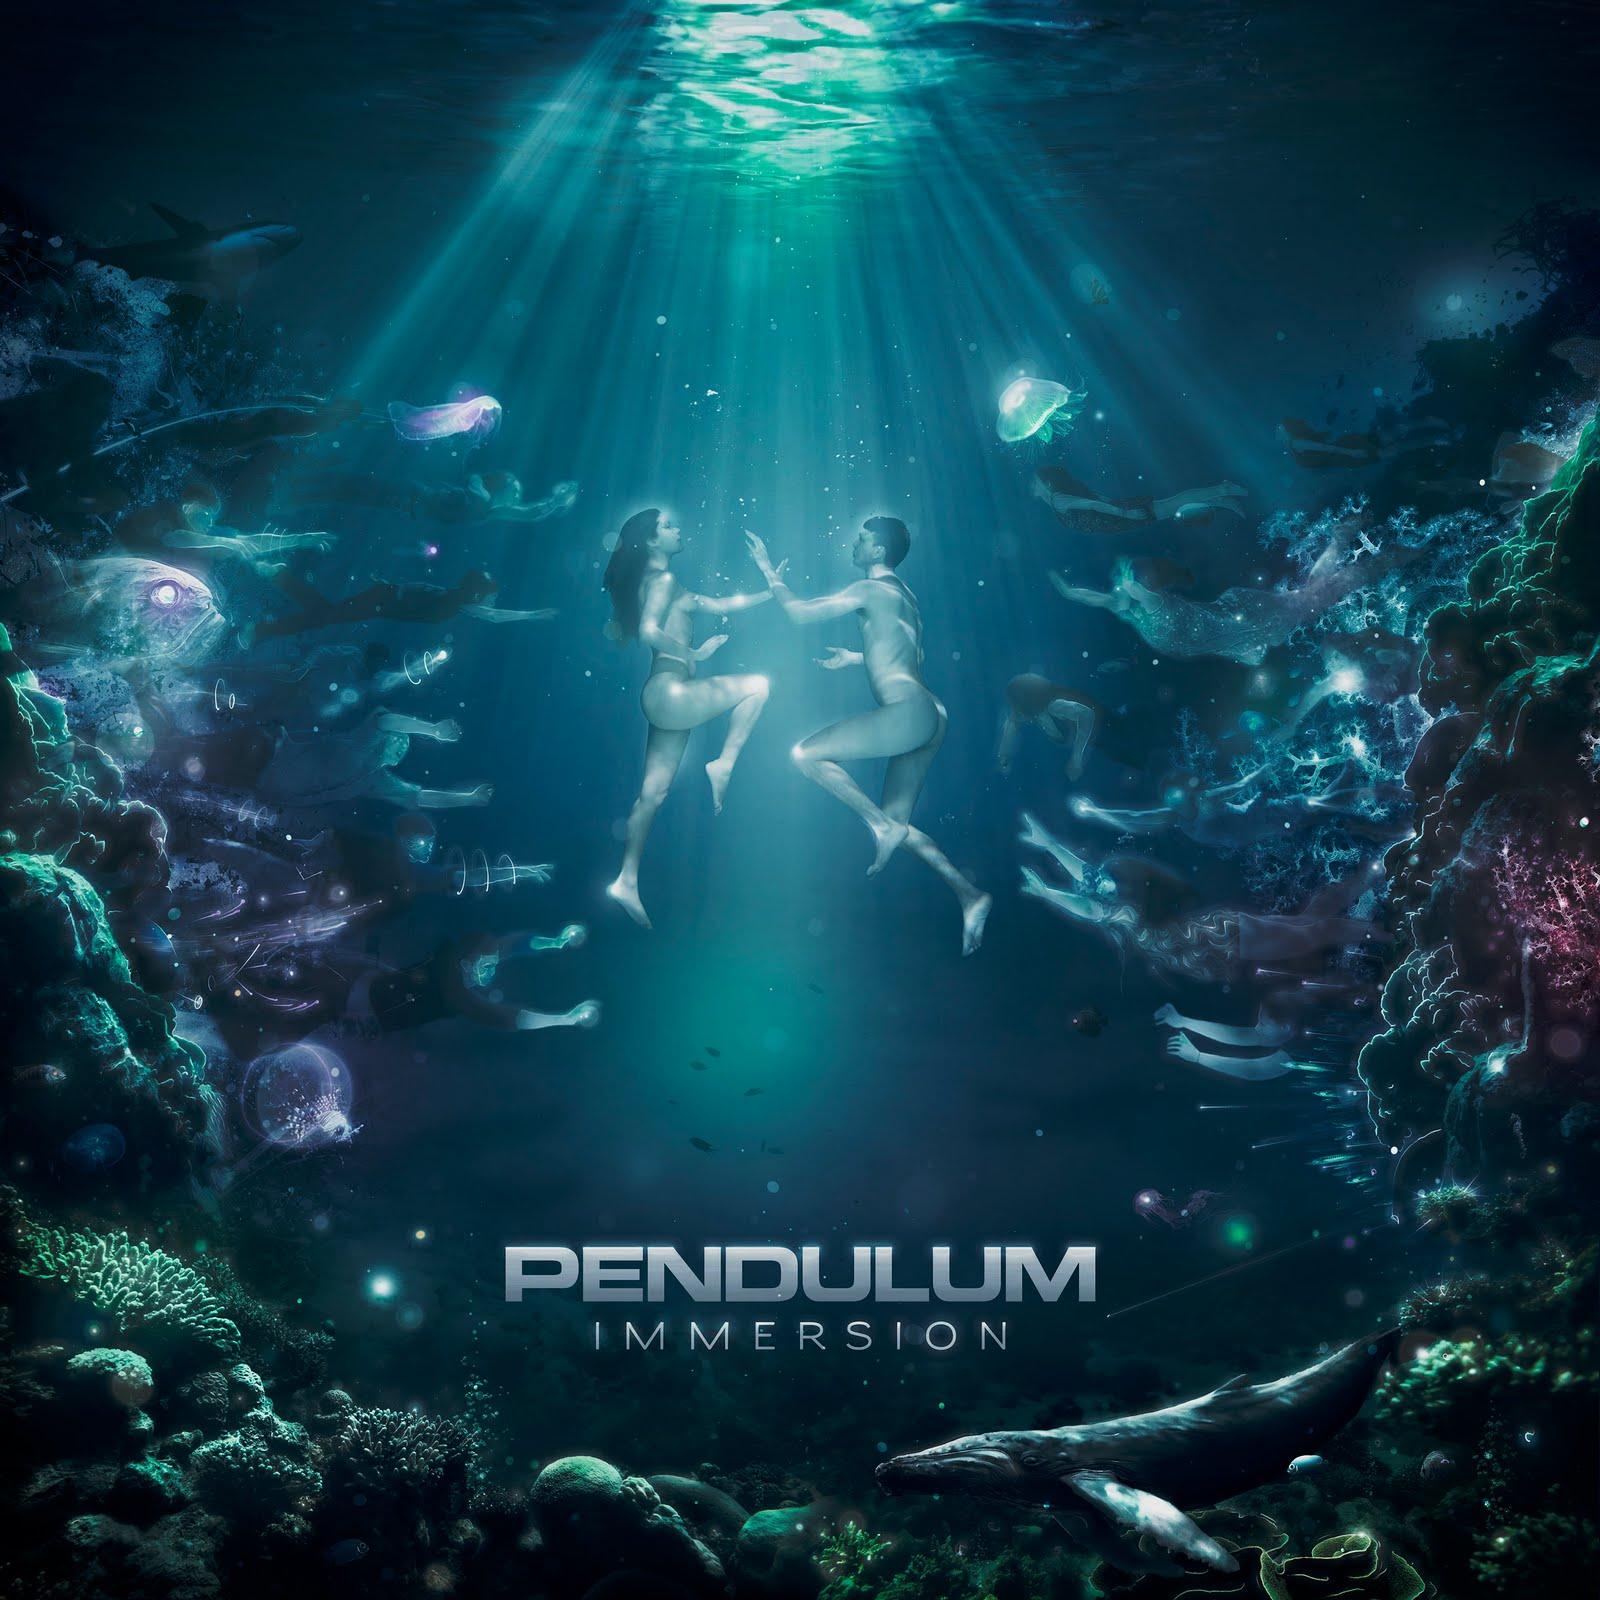 Under the Covers 4 - Página 15 Pendulum-immersion-valp-6